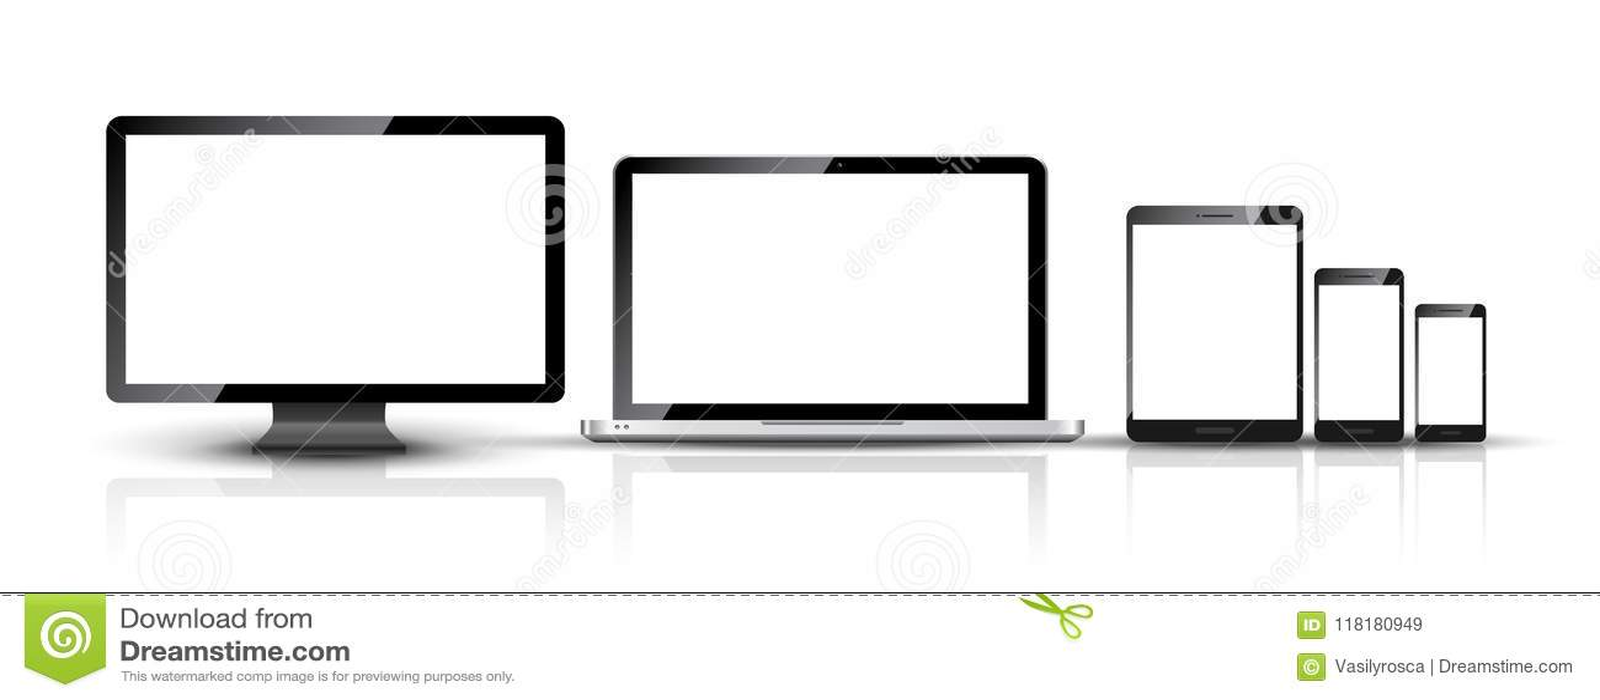 Computer monitor, smartphone, laptop and tablet pc design. Mobile phone smart digital device set